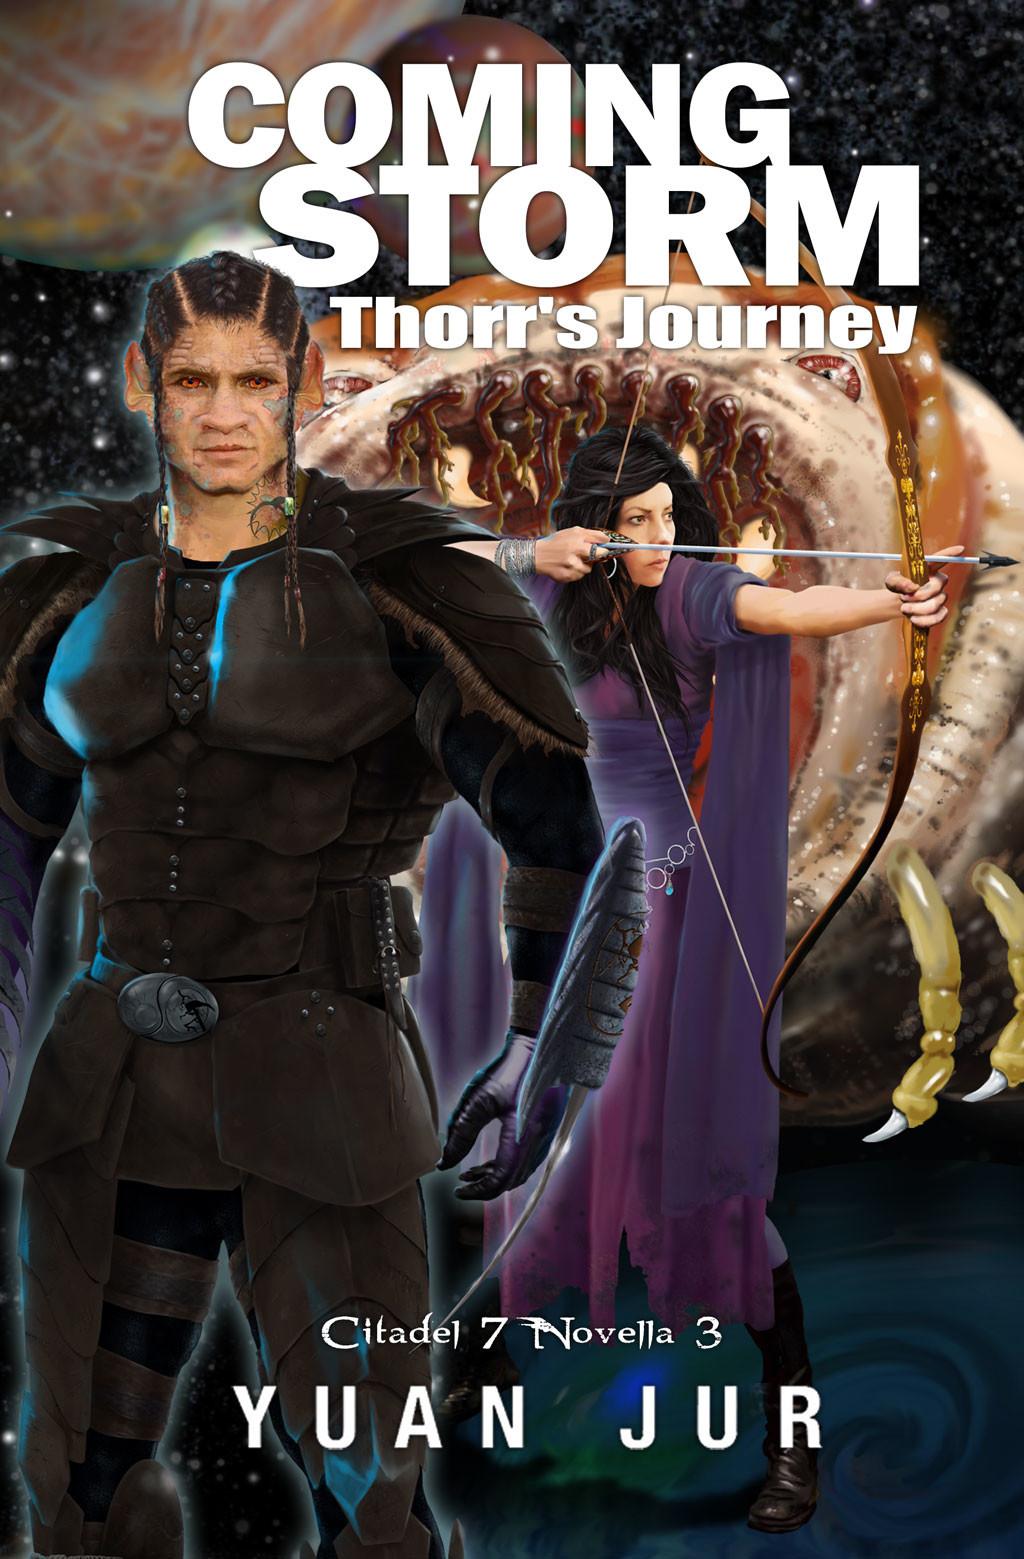 Coming Storm digital book cover design for sci-fi book series Citadel 7 by Yuan Jur. Character development & concept art of Thorr & Princess Nattai.